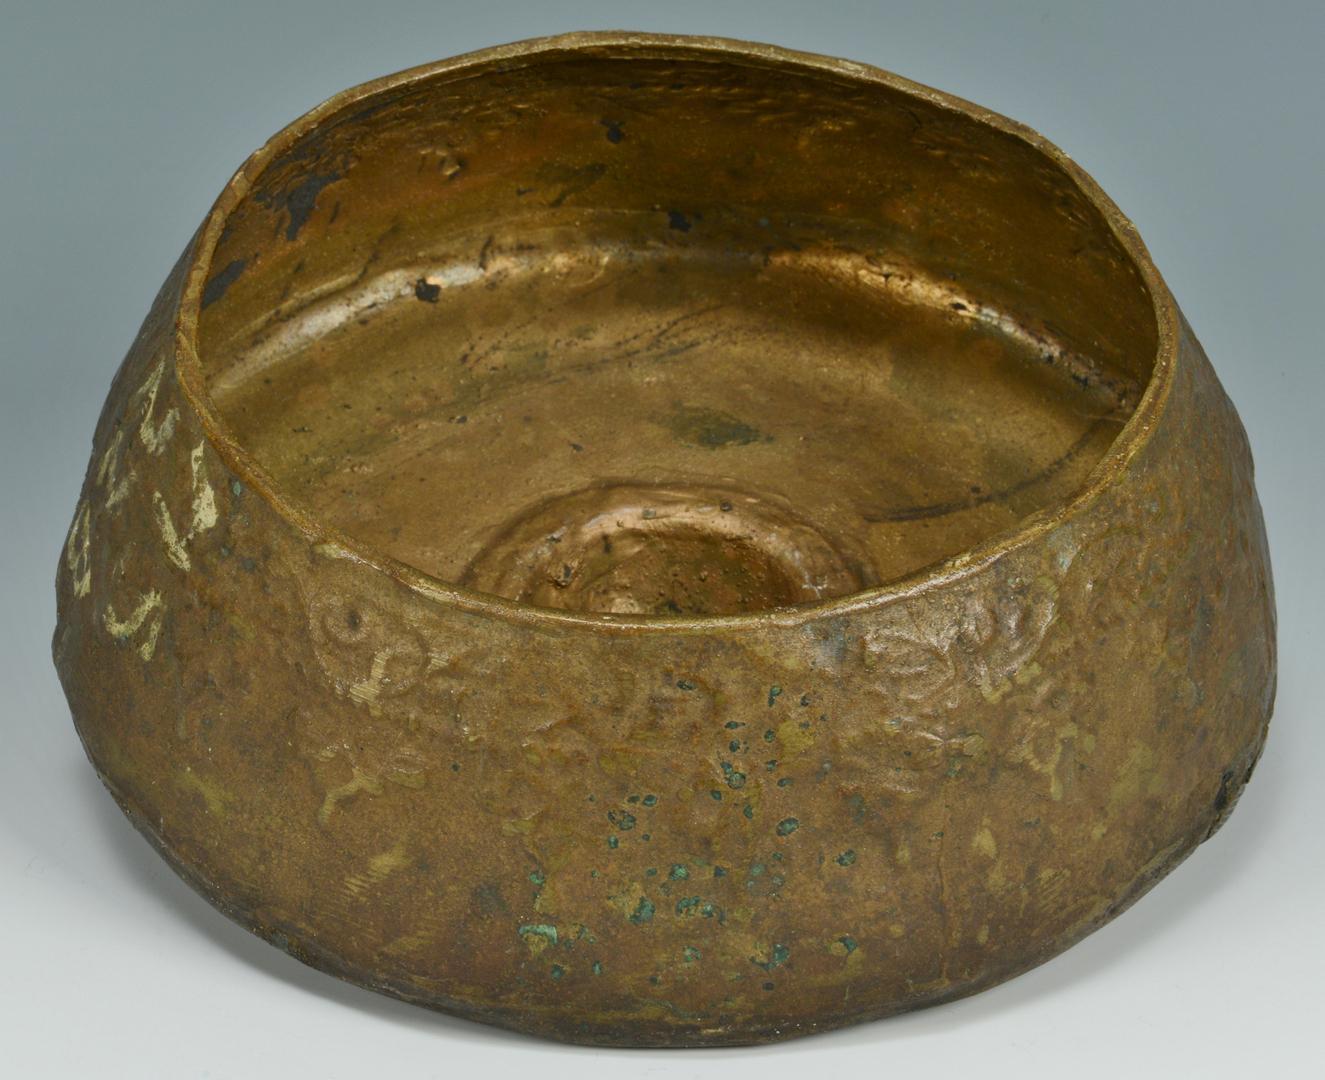 Lot 3088087: Chinese Ming Dynasty Gilt Bronze of Wenchang Wang